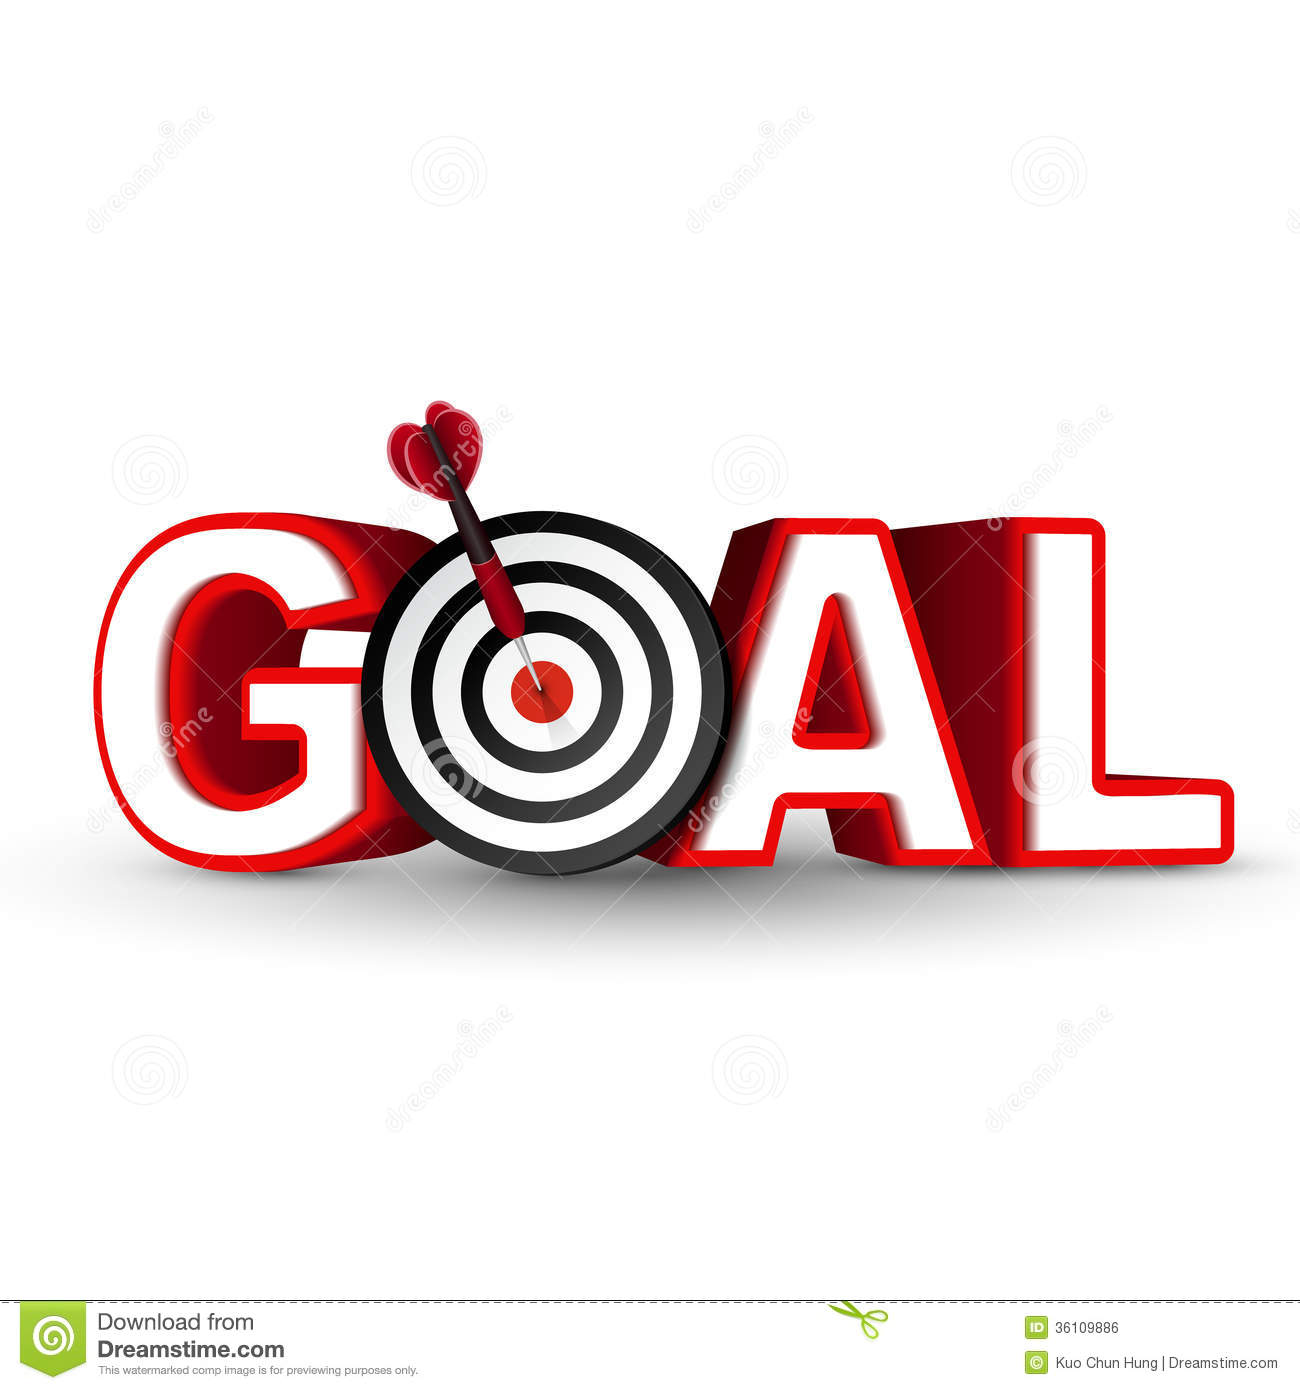 Goals clipart goal target. Clip art free panda